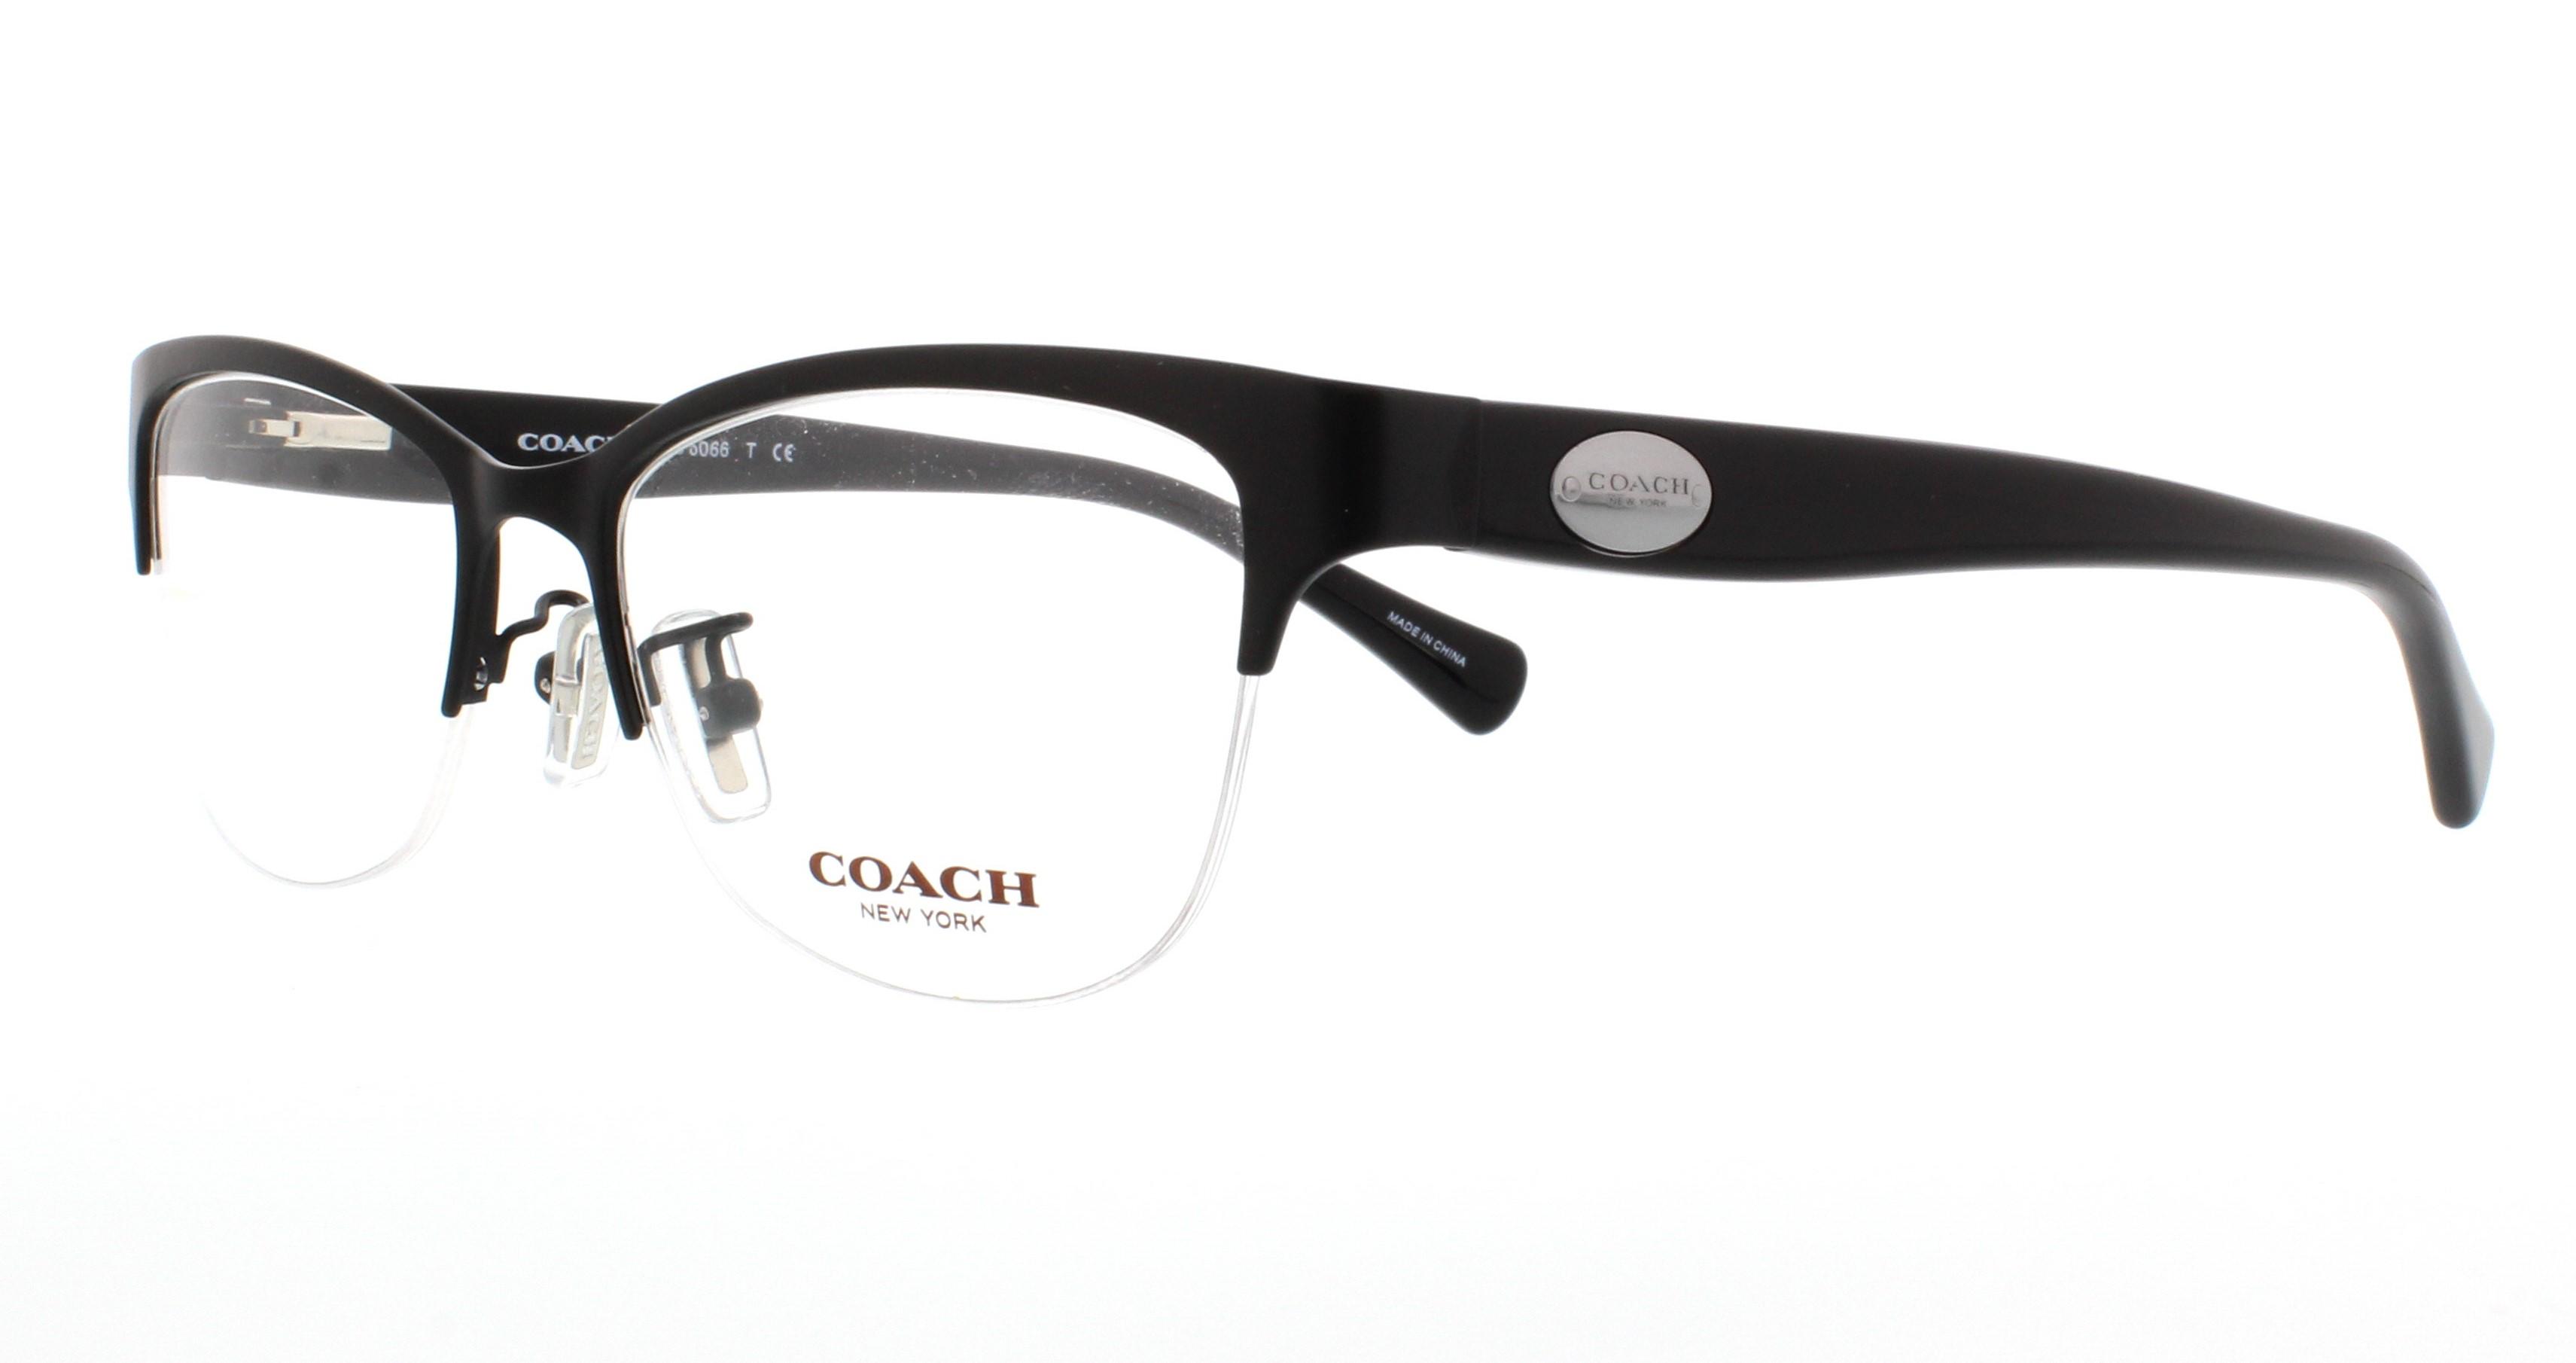 coach holiday bags walmart eye exam rh primacareprenatal com